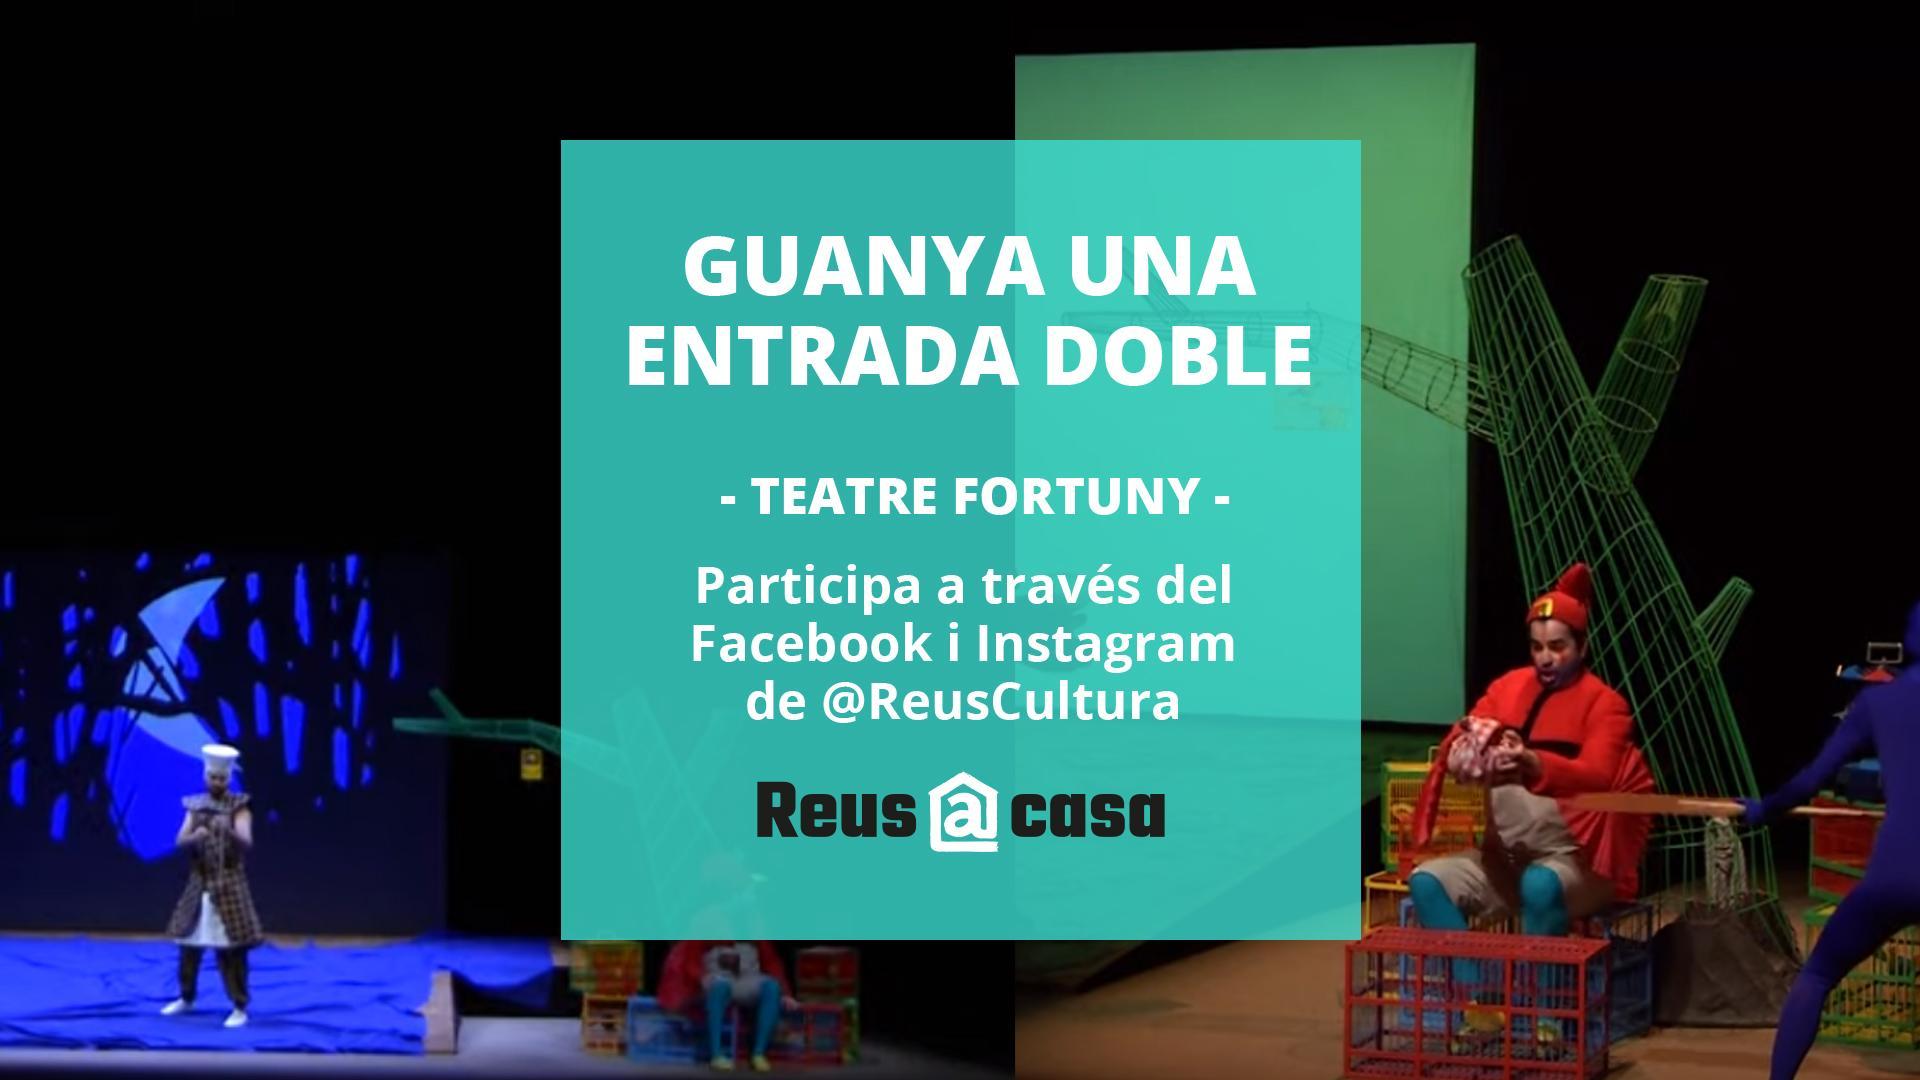 Teatre Fortuny: Sorteig de dues entrades dobles